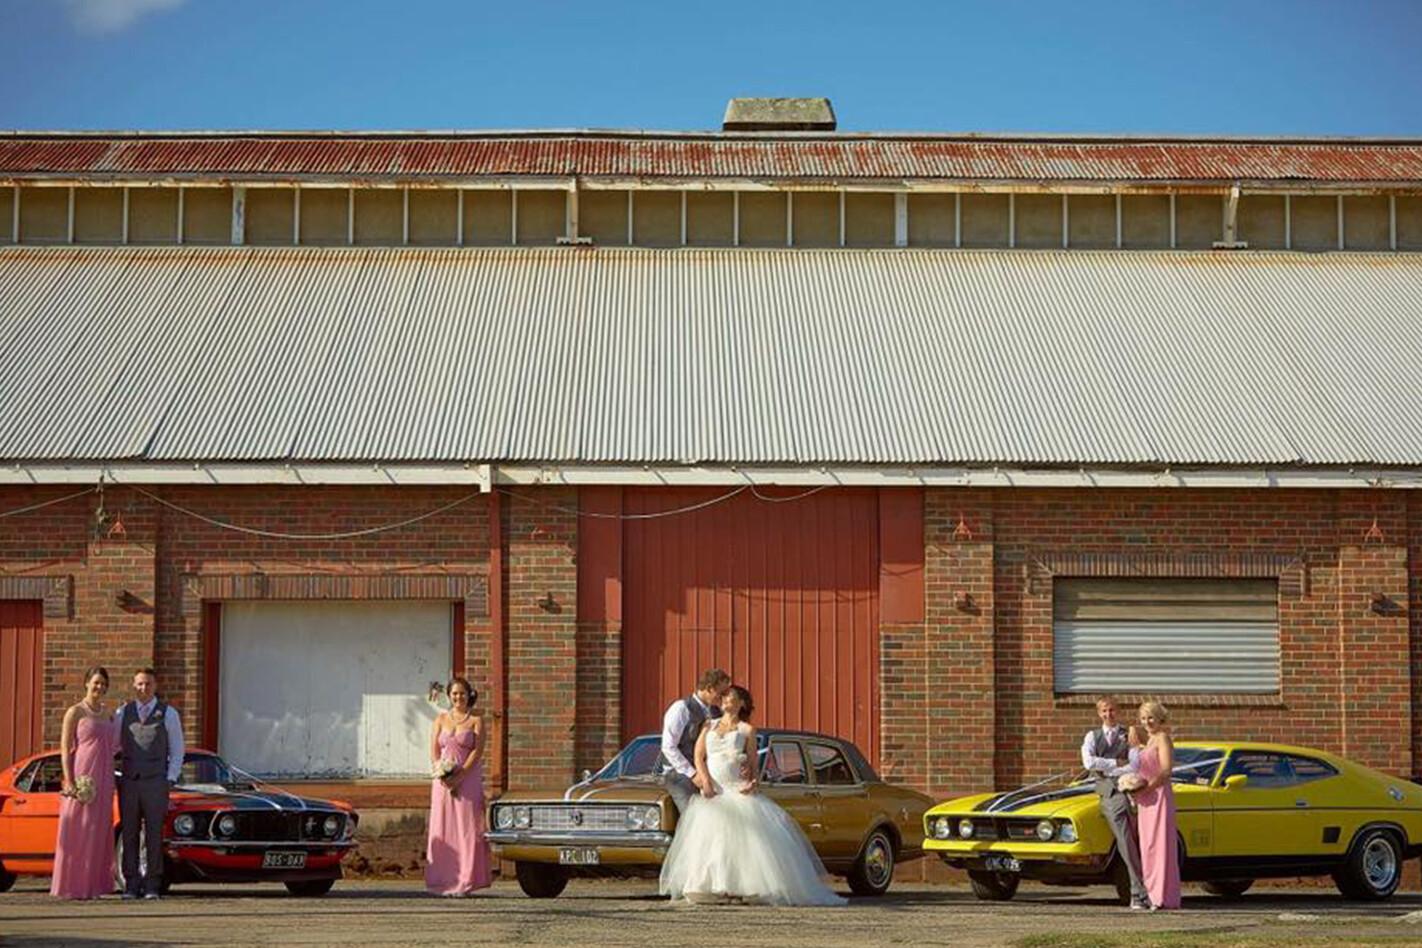 Mitchell Hynd's wedding cars